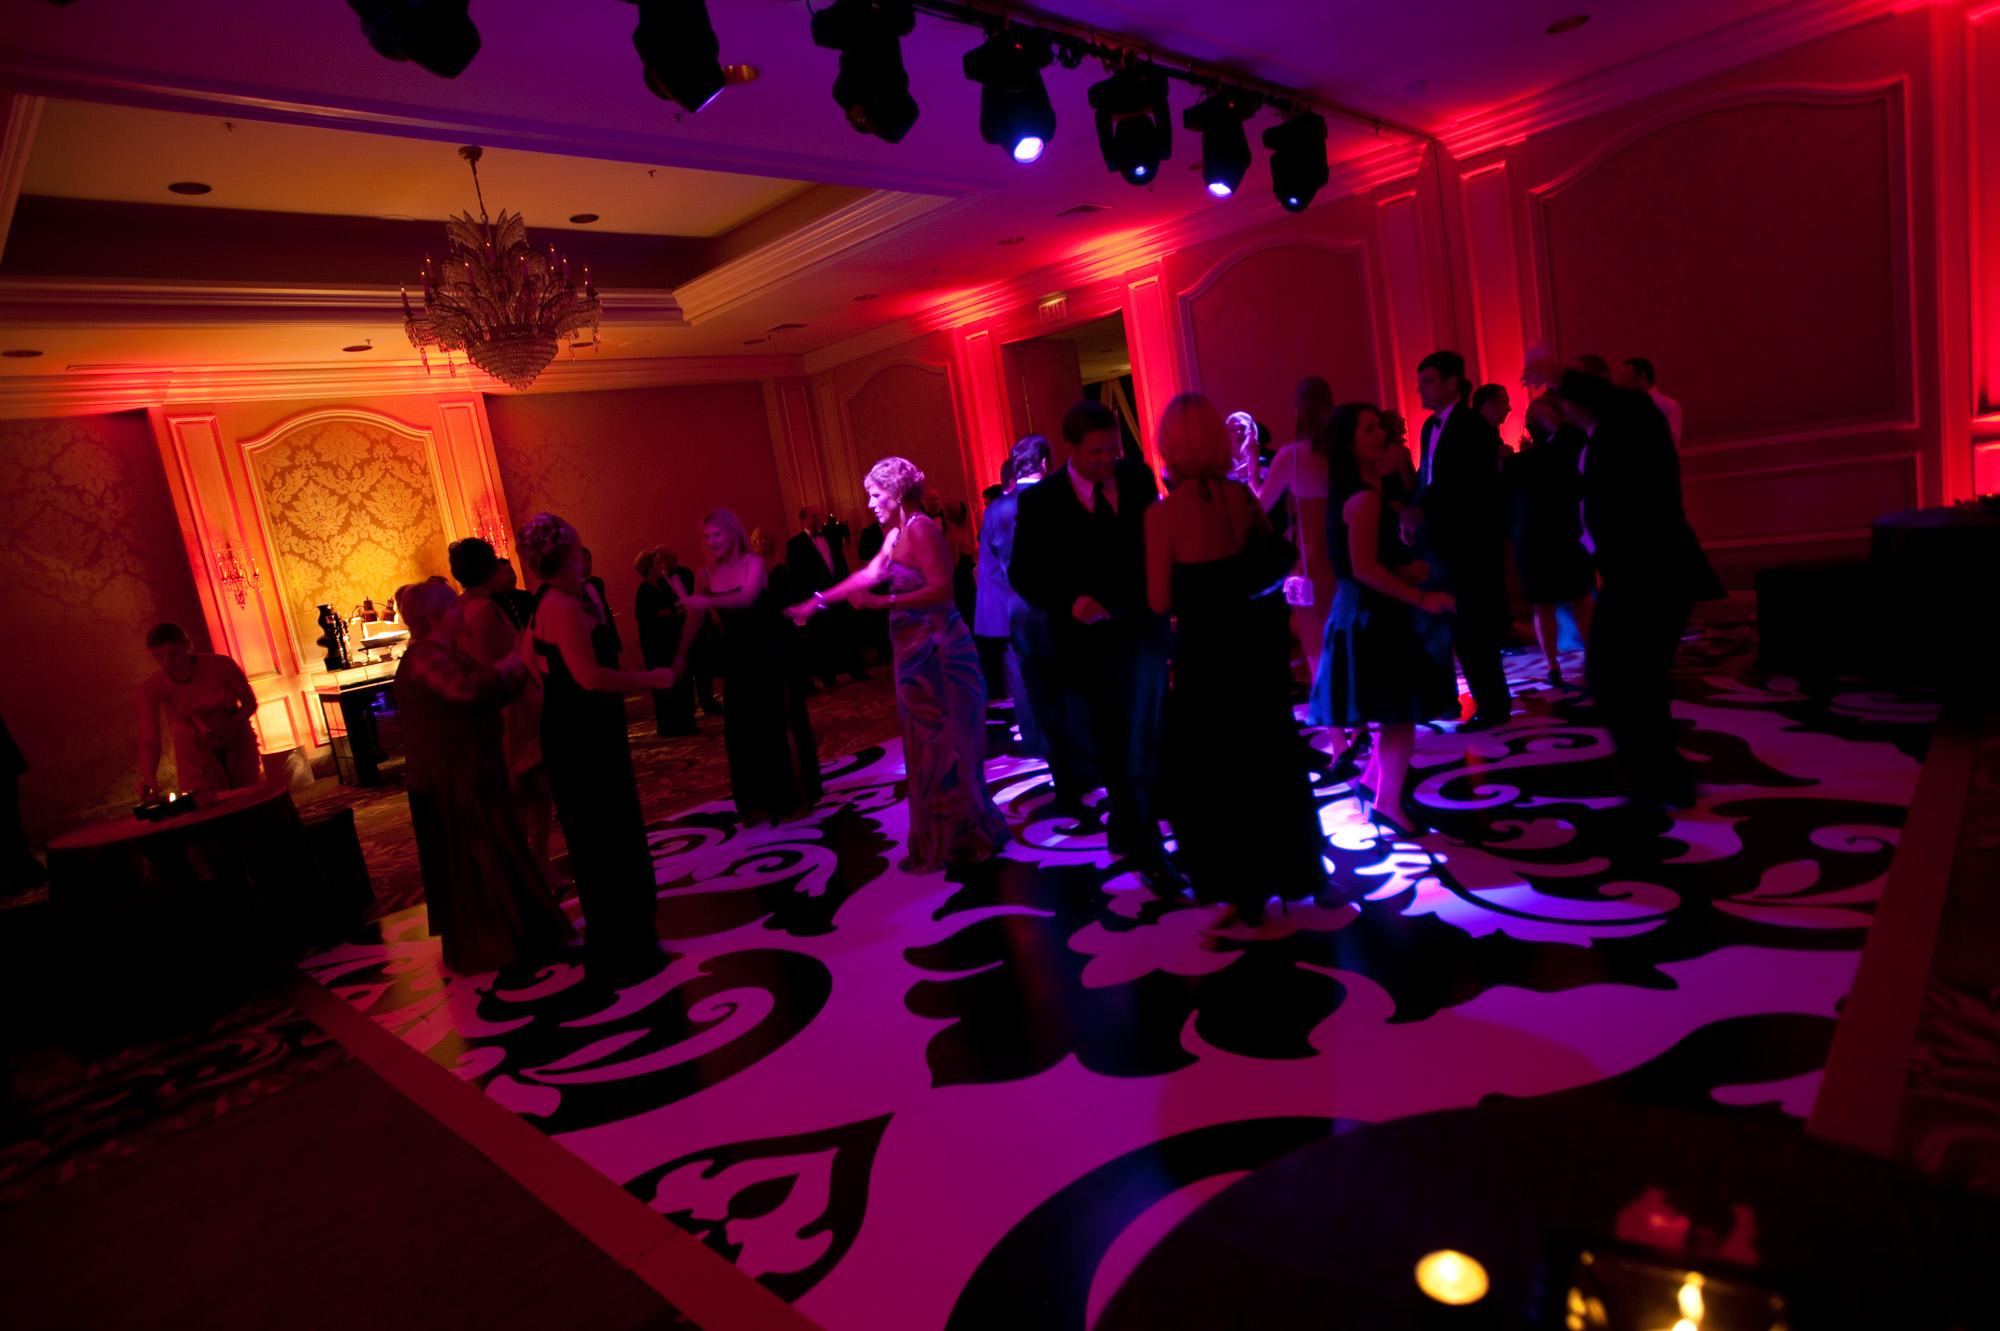 birch-bespoke-events-and-weddings-34.jpg